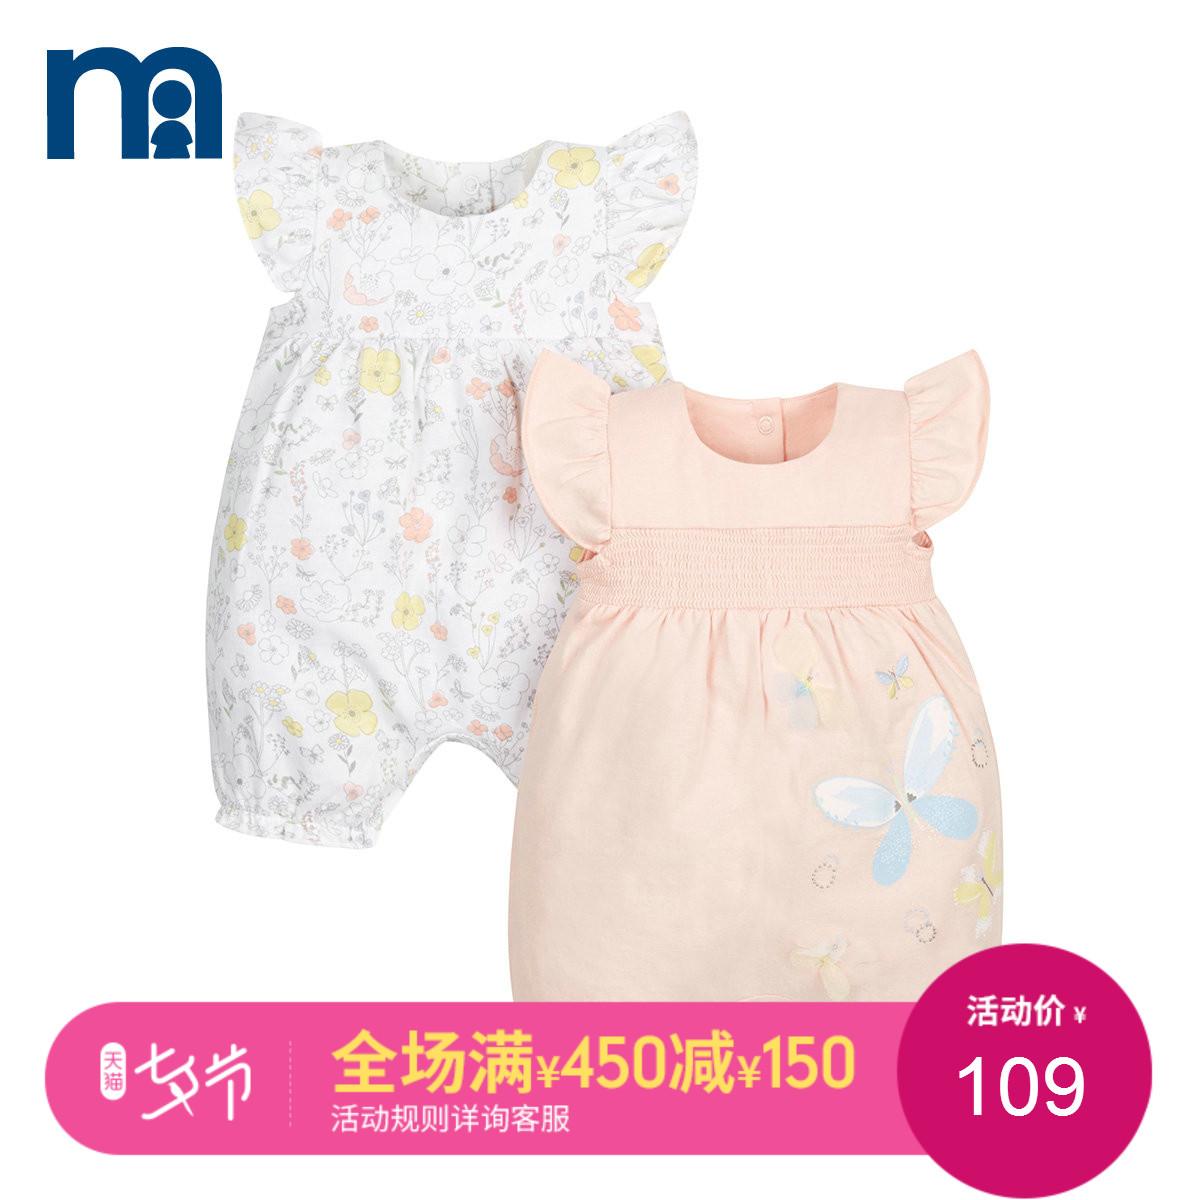 mothercare英国女婴连体衣2件装夏装婴儿衣服宝宝短爬服哈衣